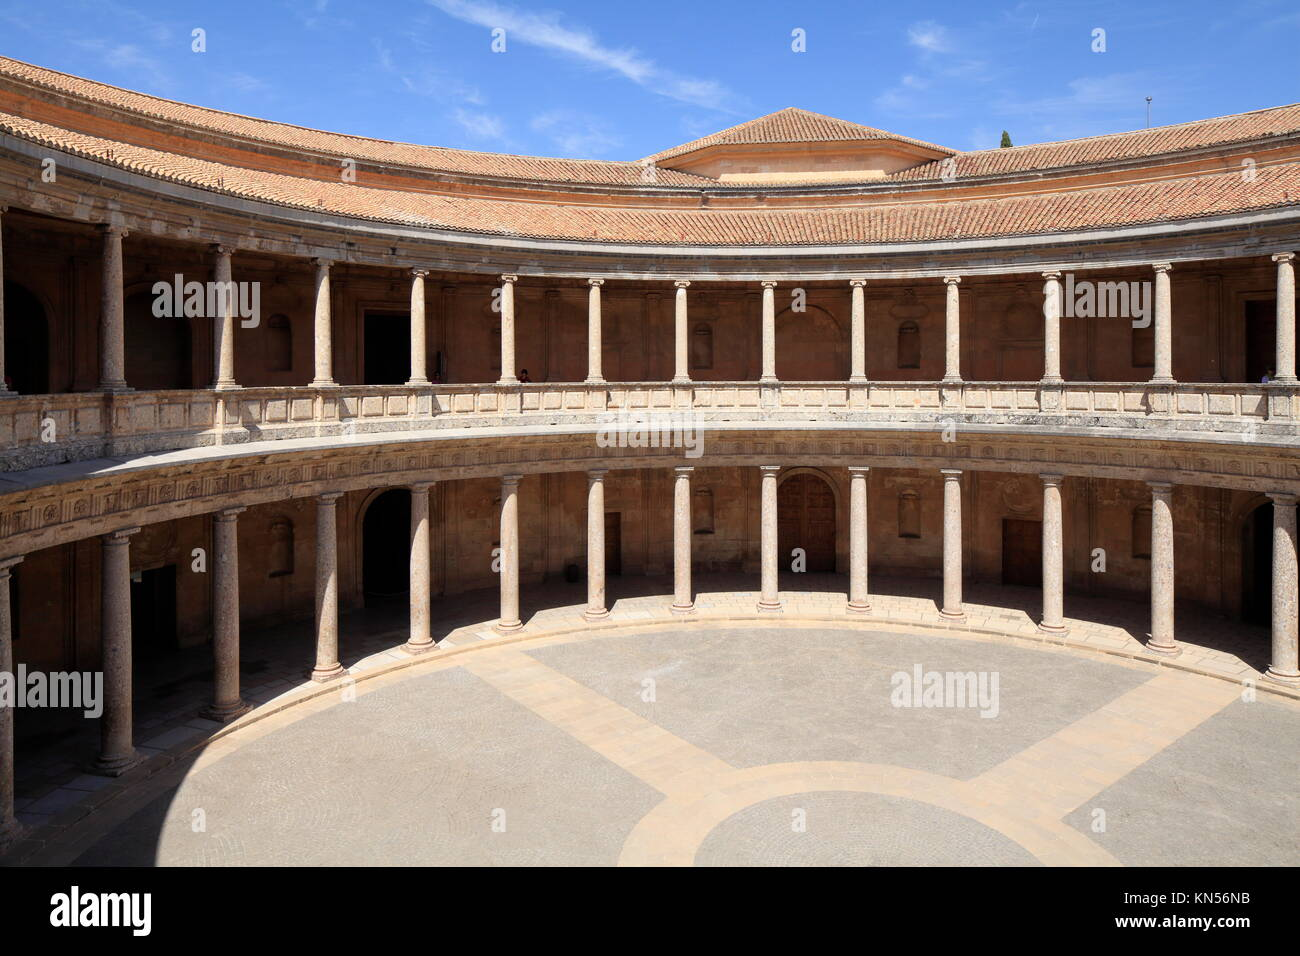 Palace of Charles V, Alhambra Palace, Granada, Spain Stock Photo